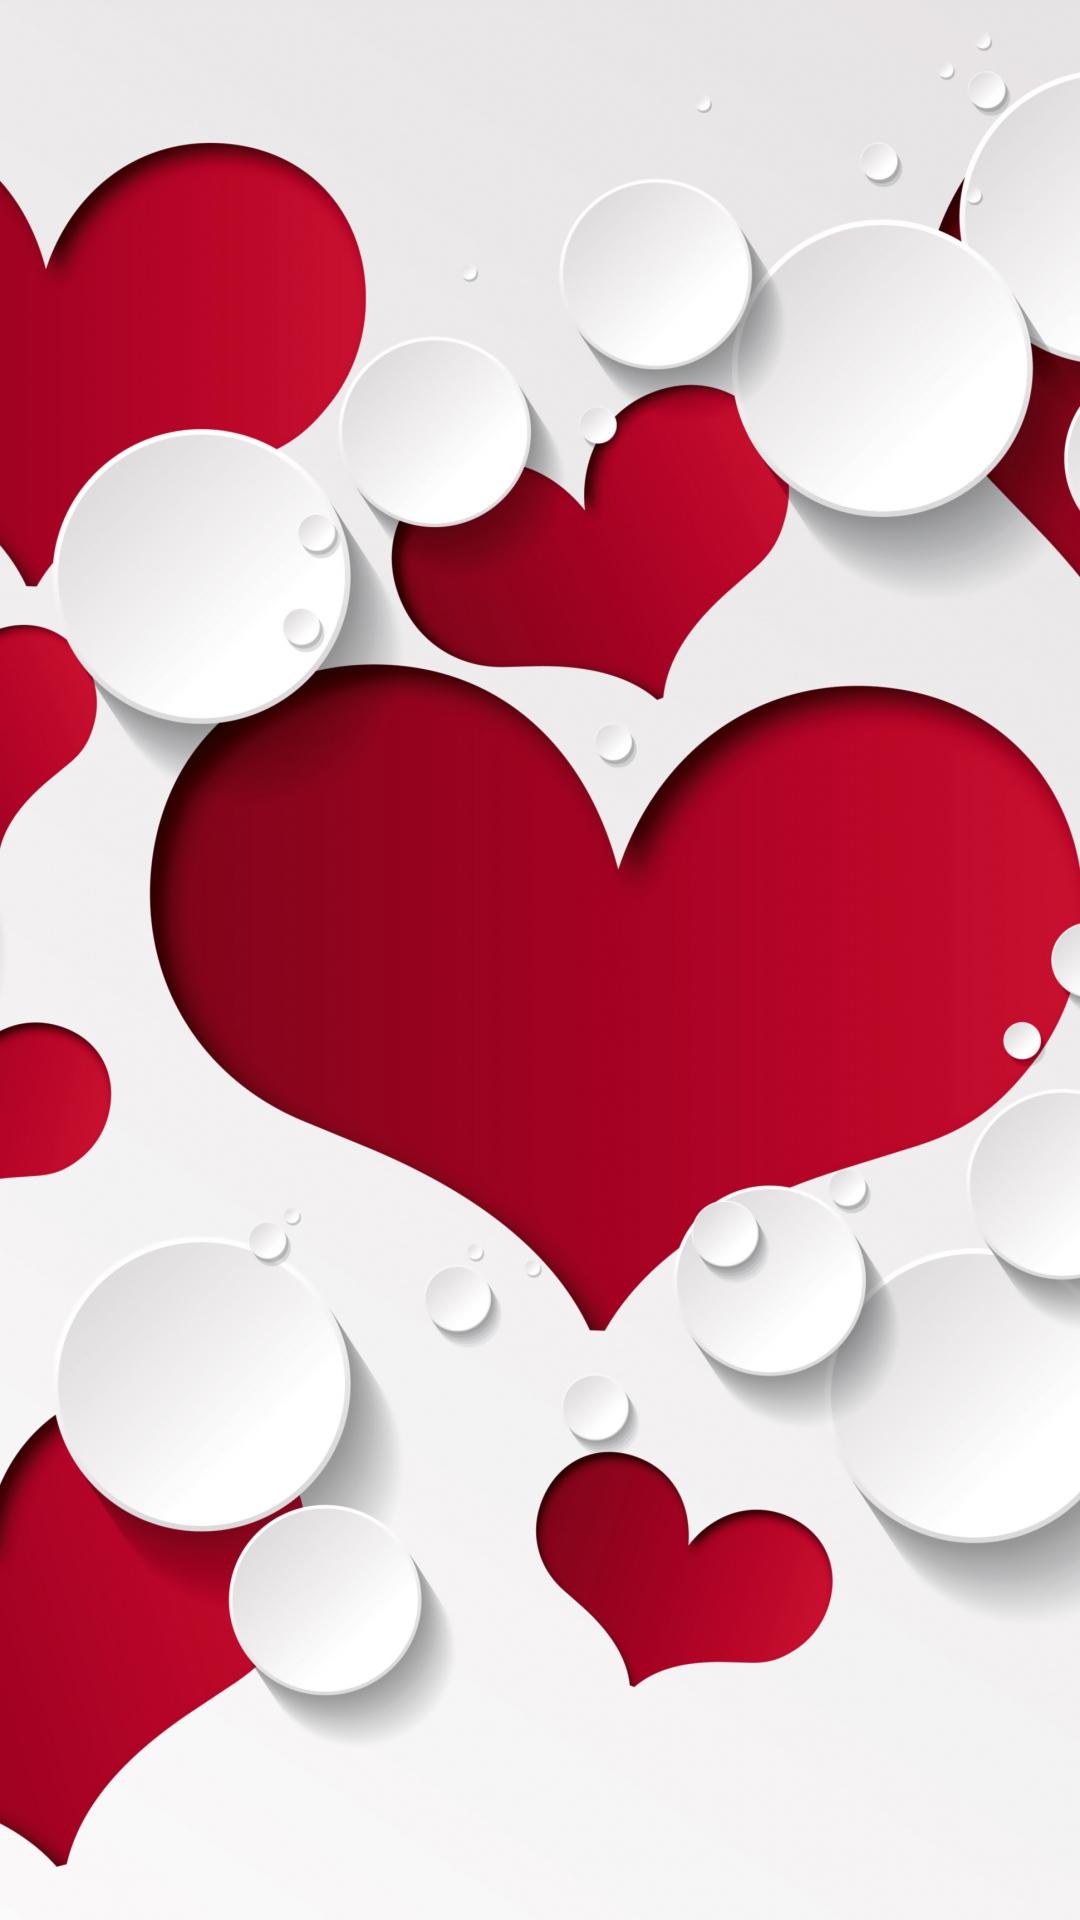 Heart Shape Wallpapers Iphone Wallpaper